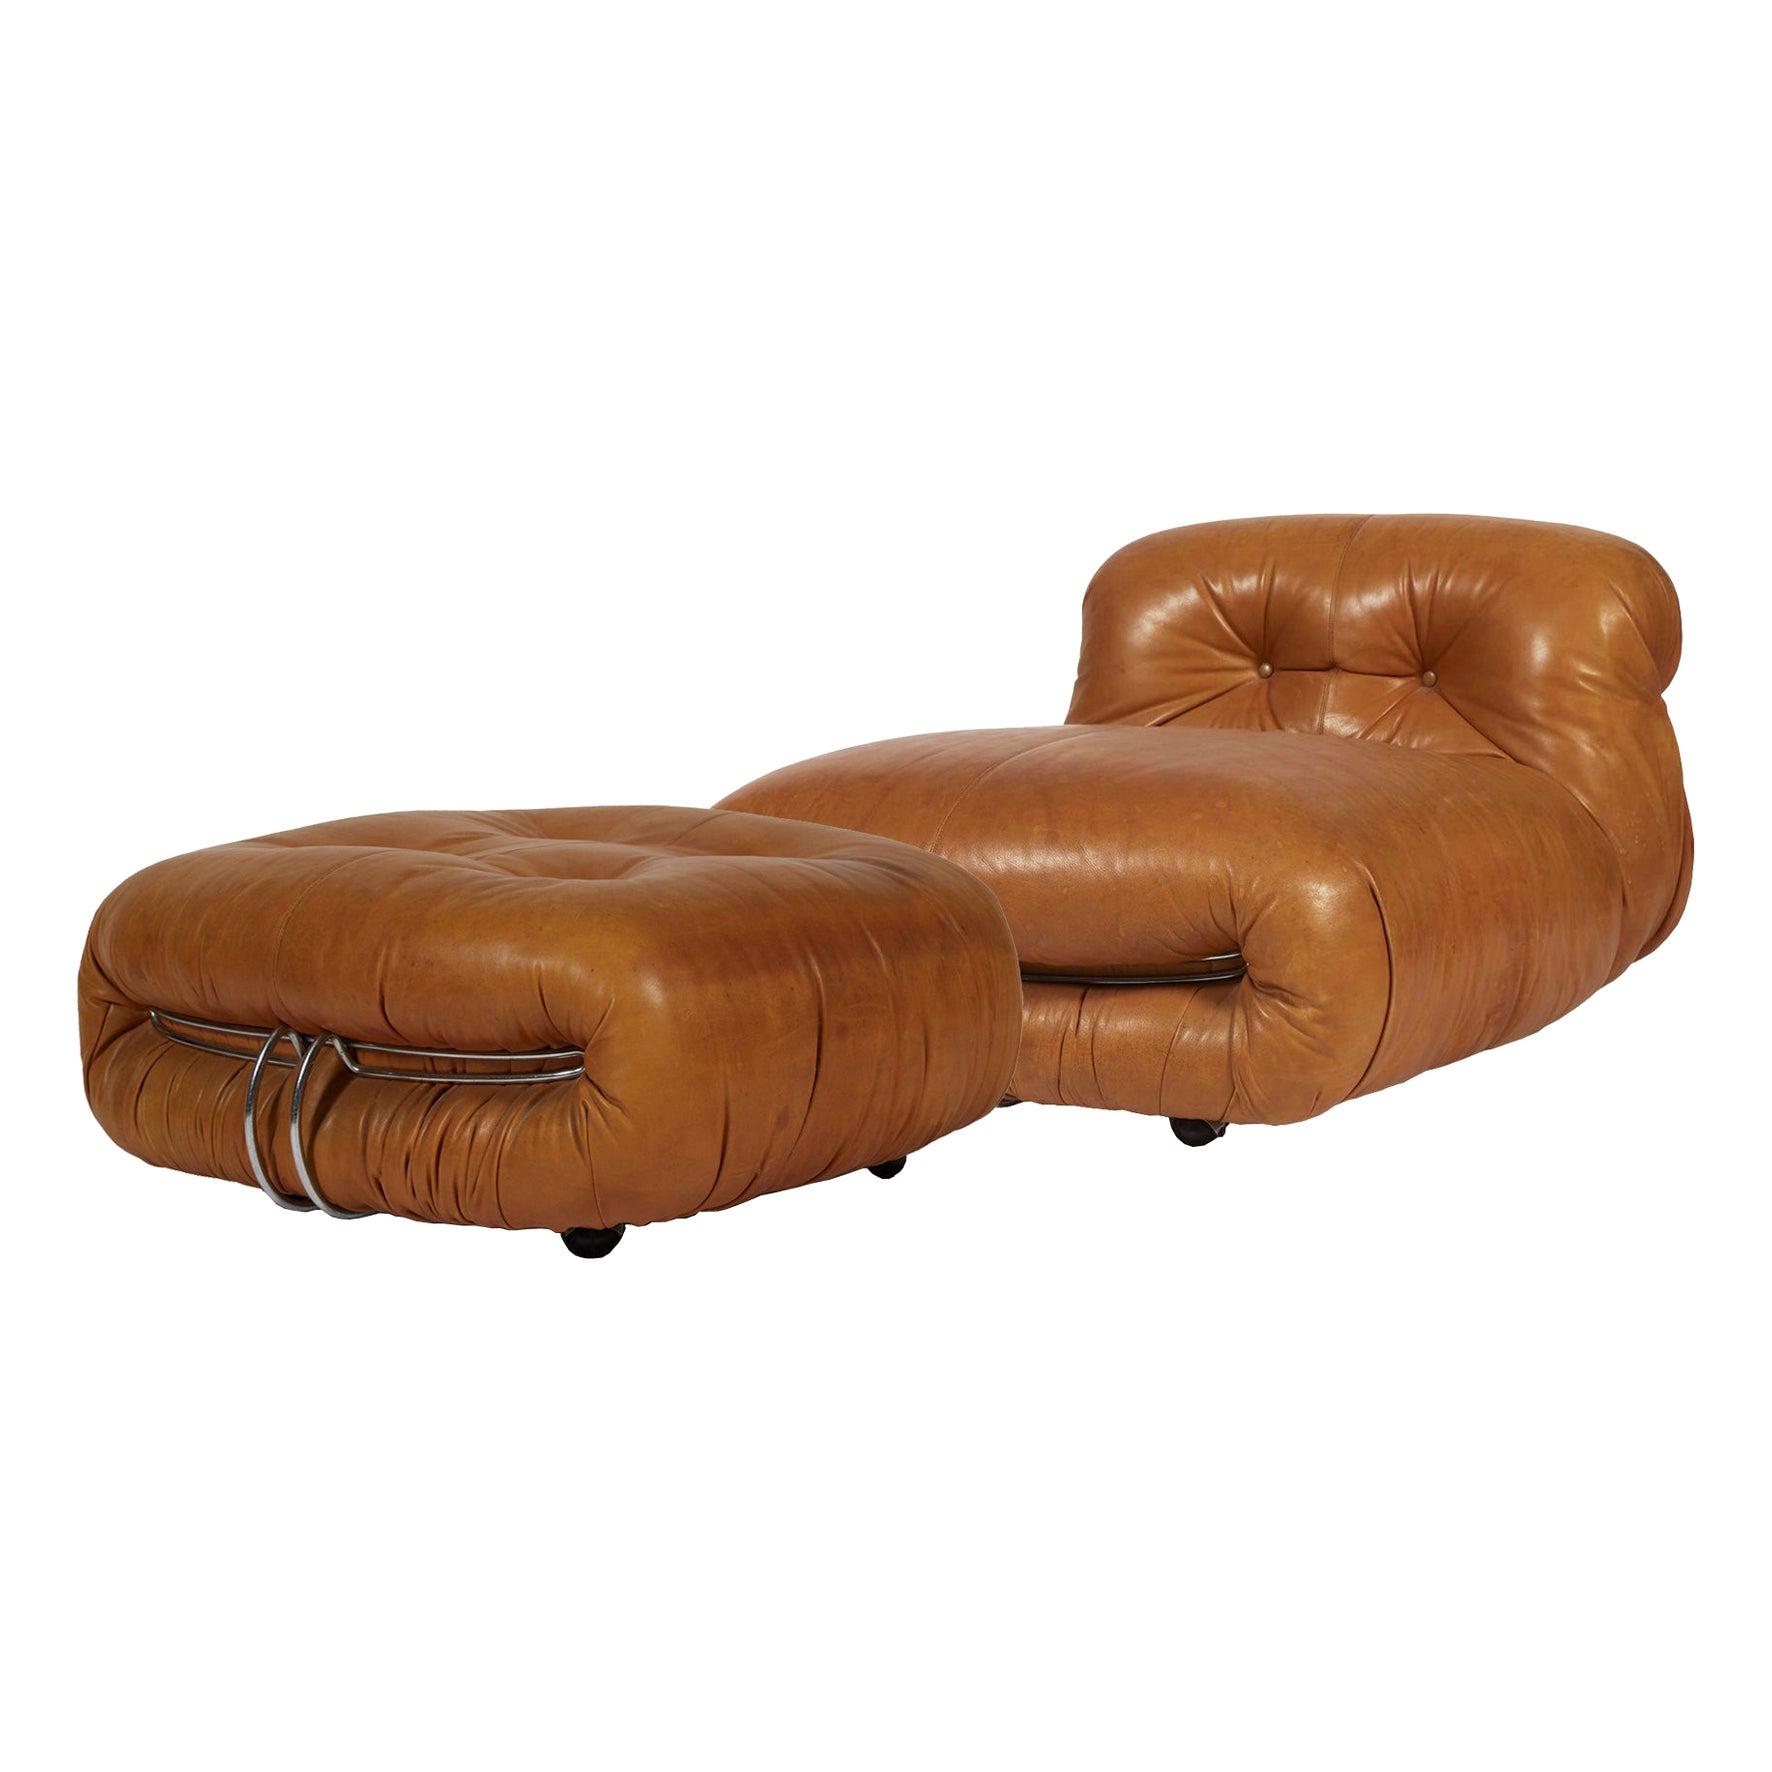 Afra & Tobia Scarpa, Soriana Lounge Chair and Ottoman, Cassina